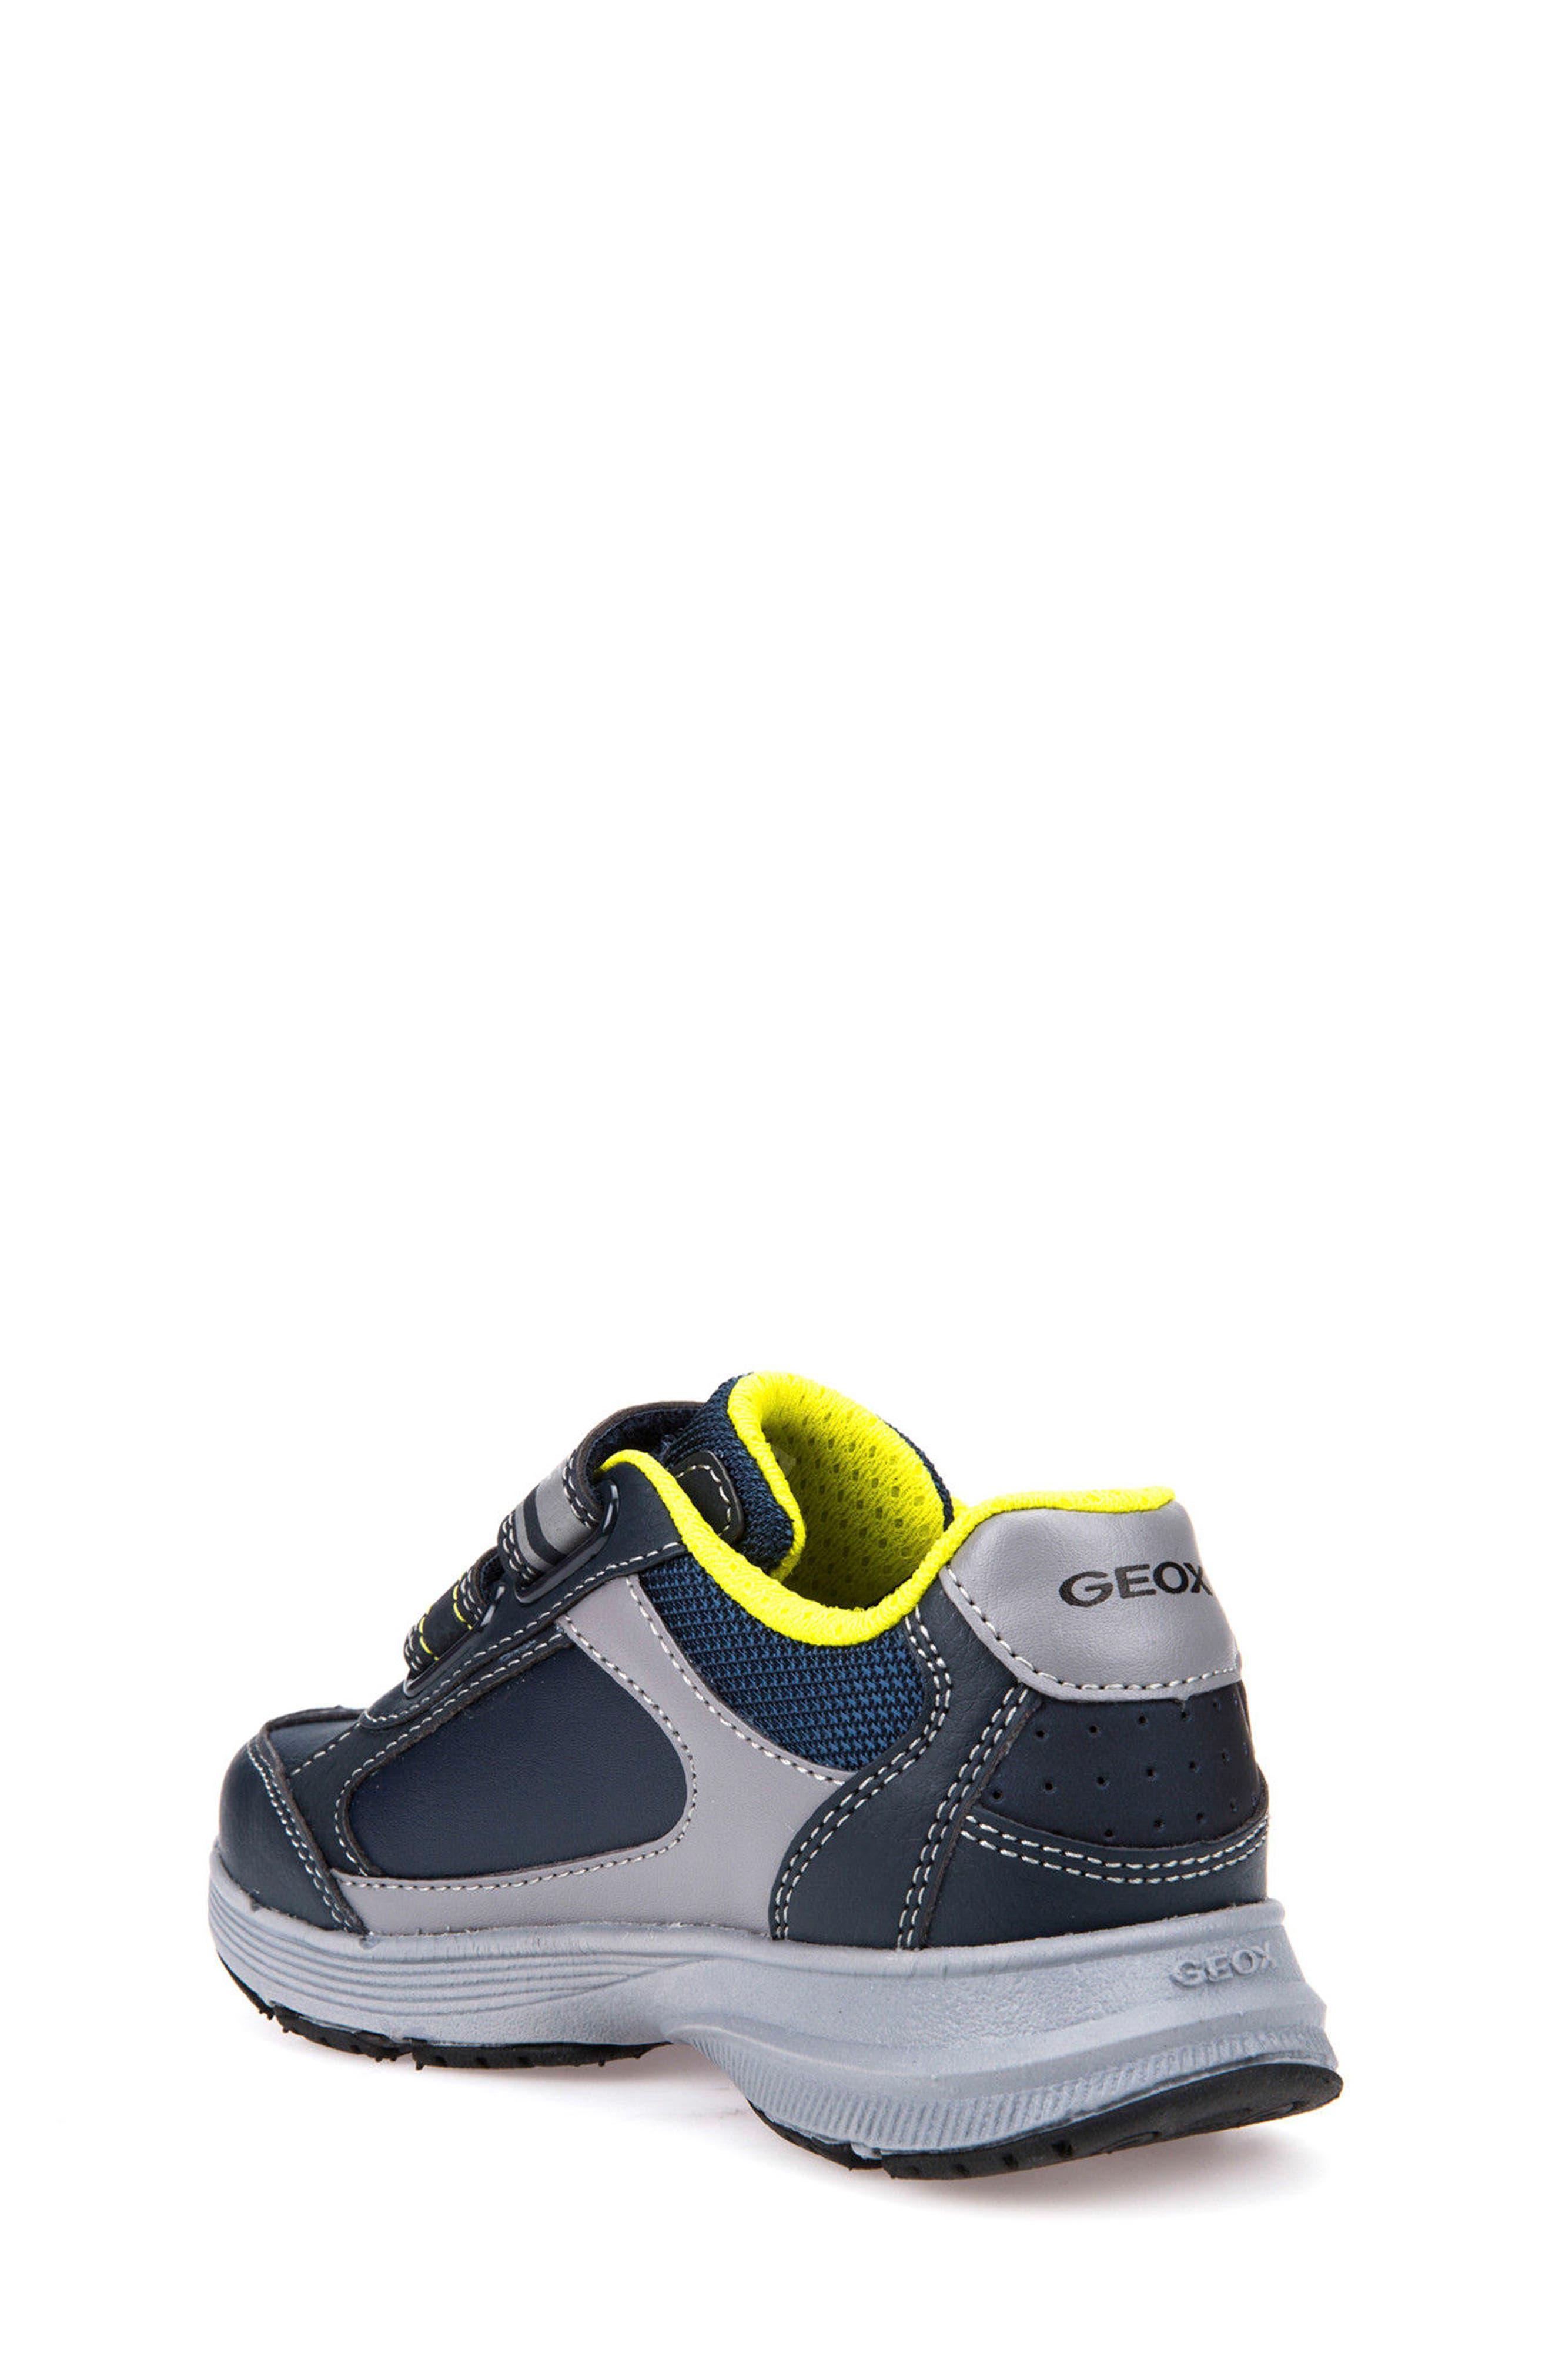 Top Fly Sneaker,                             Alternate thumbnail 2, color,                             Navy